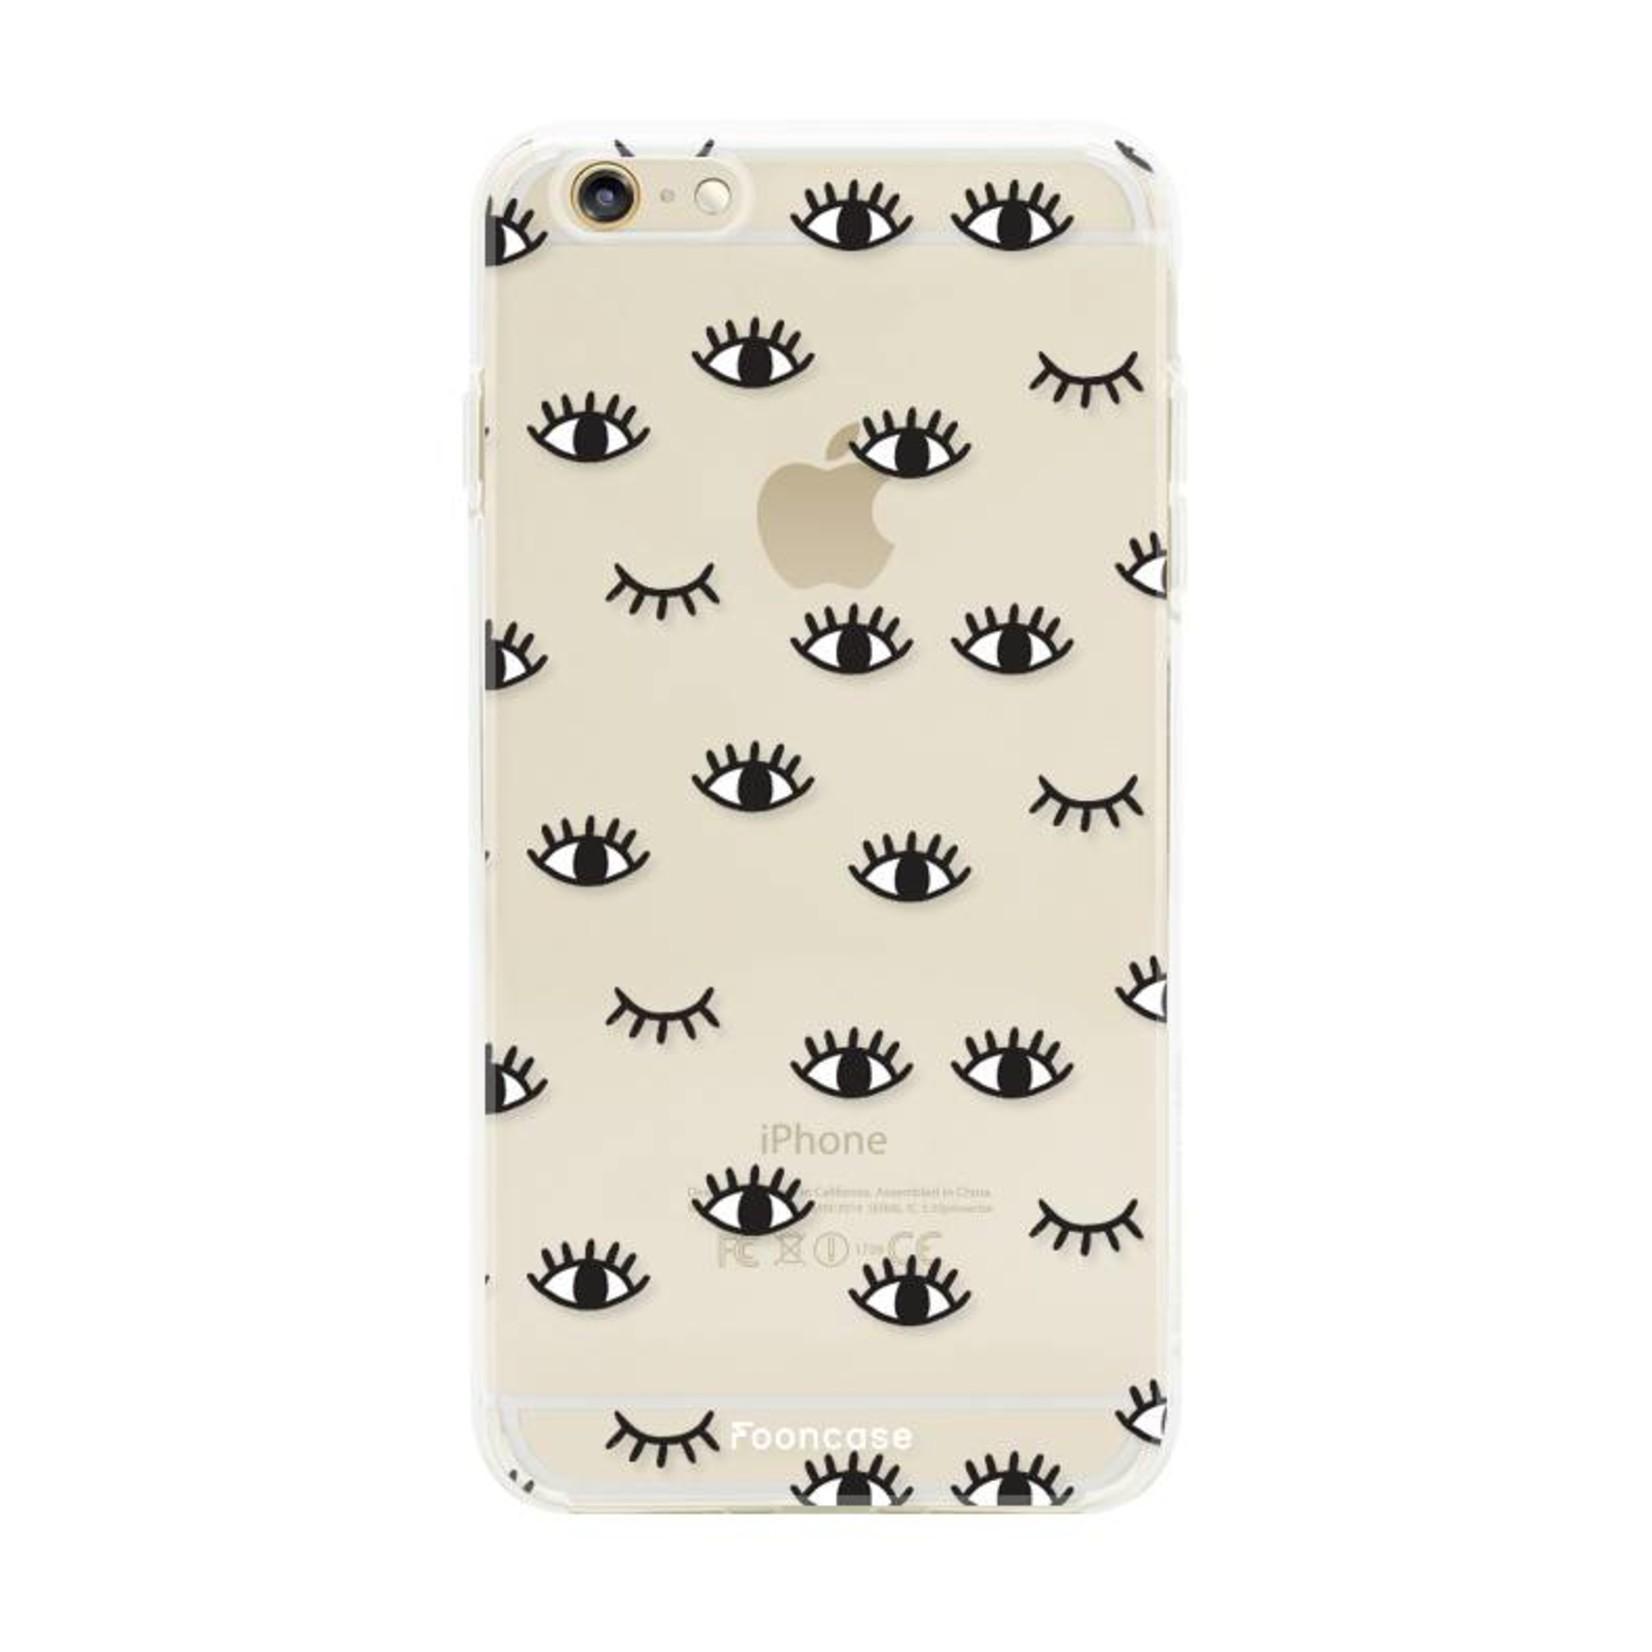 FOONCASE iPhone 6 / 6S hoesje TPU Soft Case - Back Cover - Eyes / Ogen